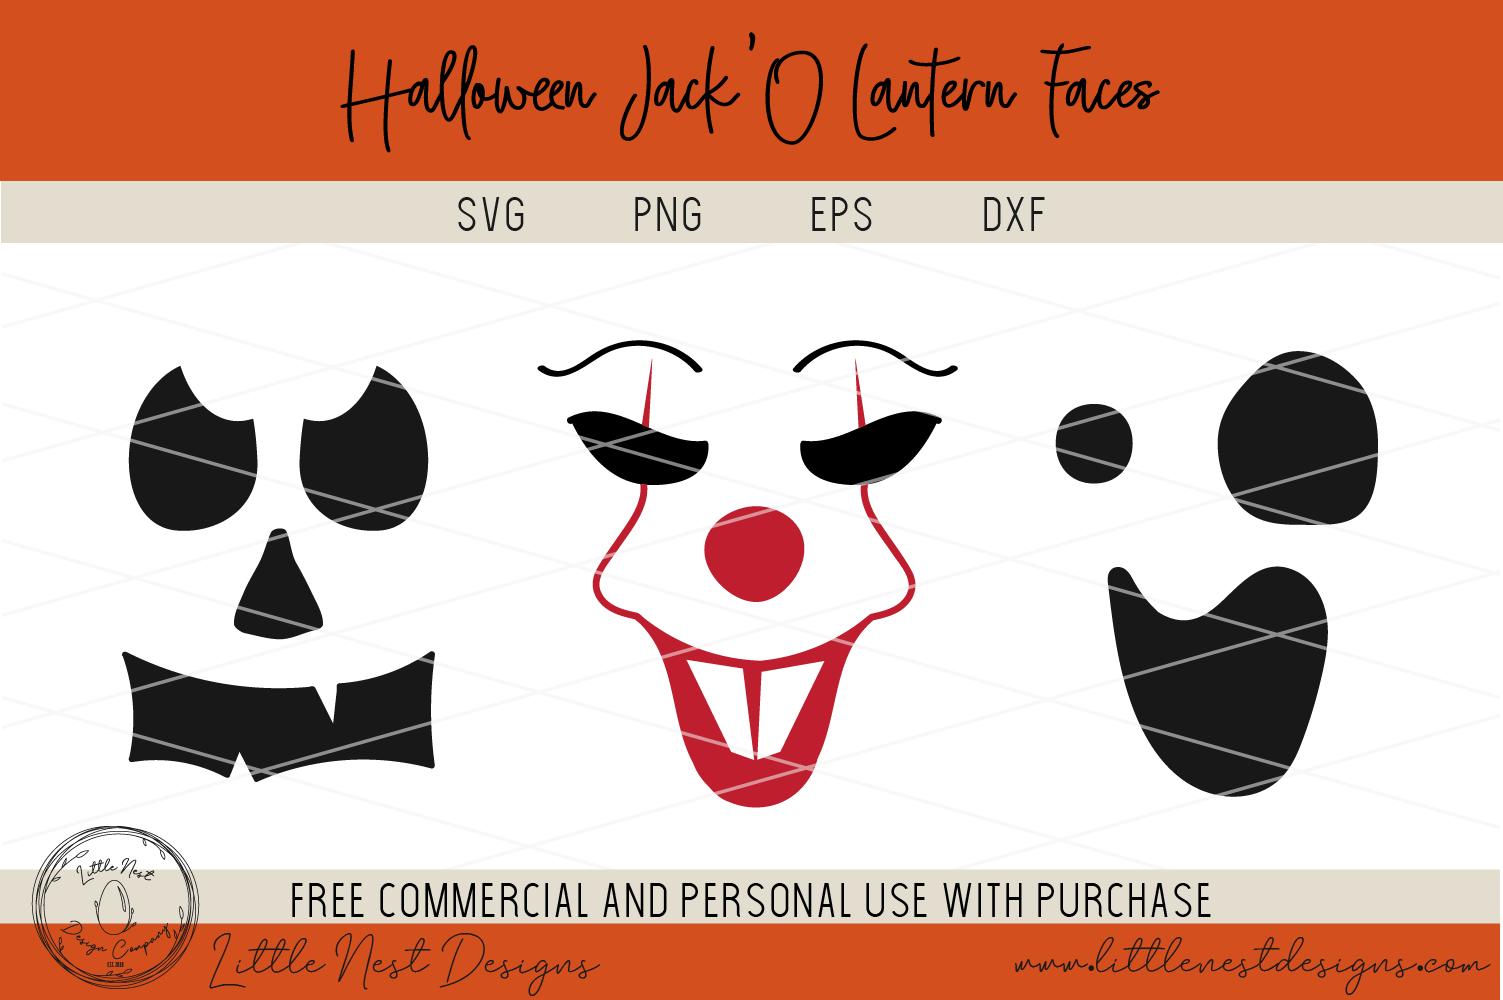 Halloween Jack O Lantern Faces - Pumpkin Faces - SVG Pumpkin example image 4